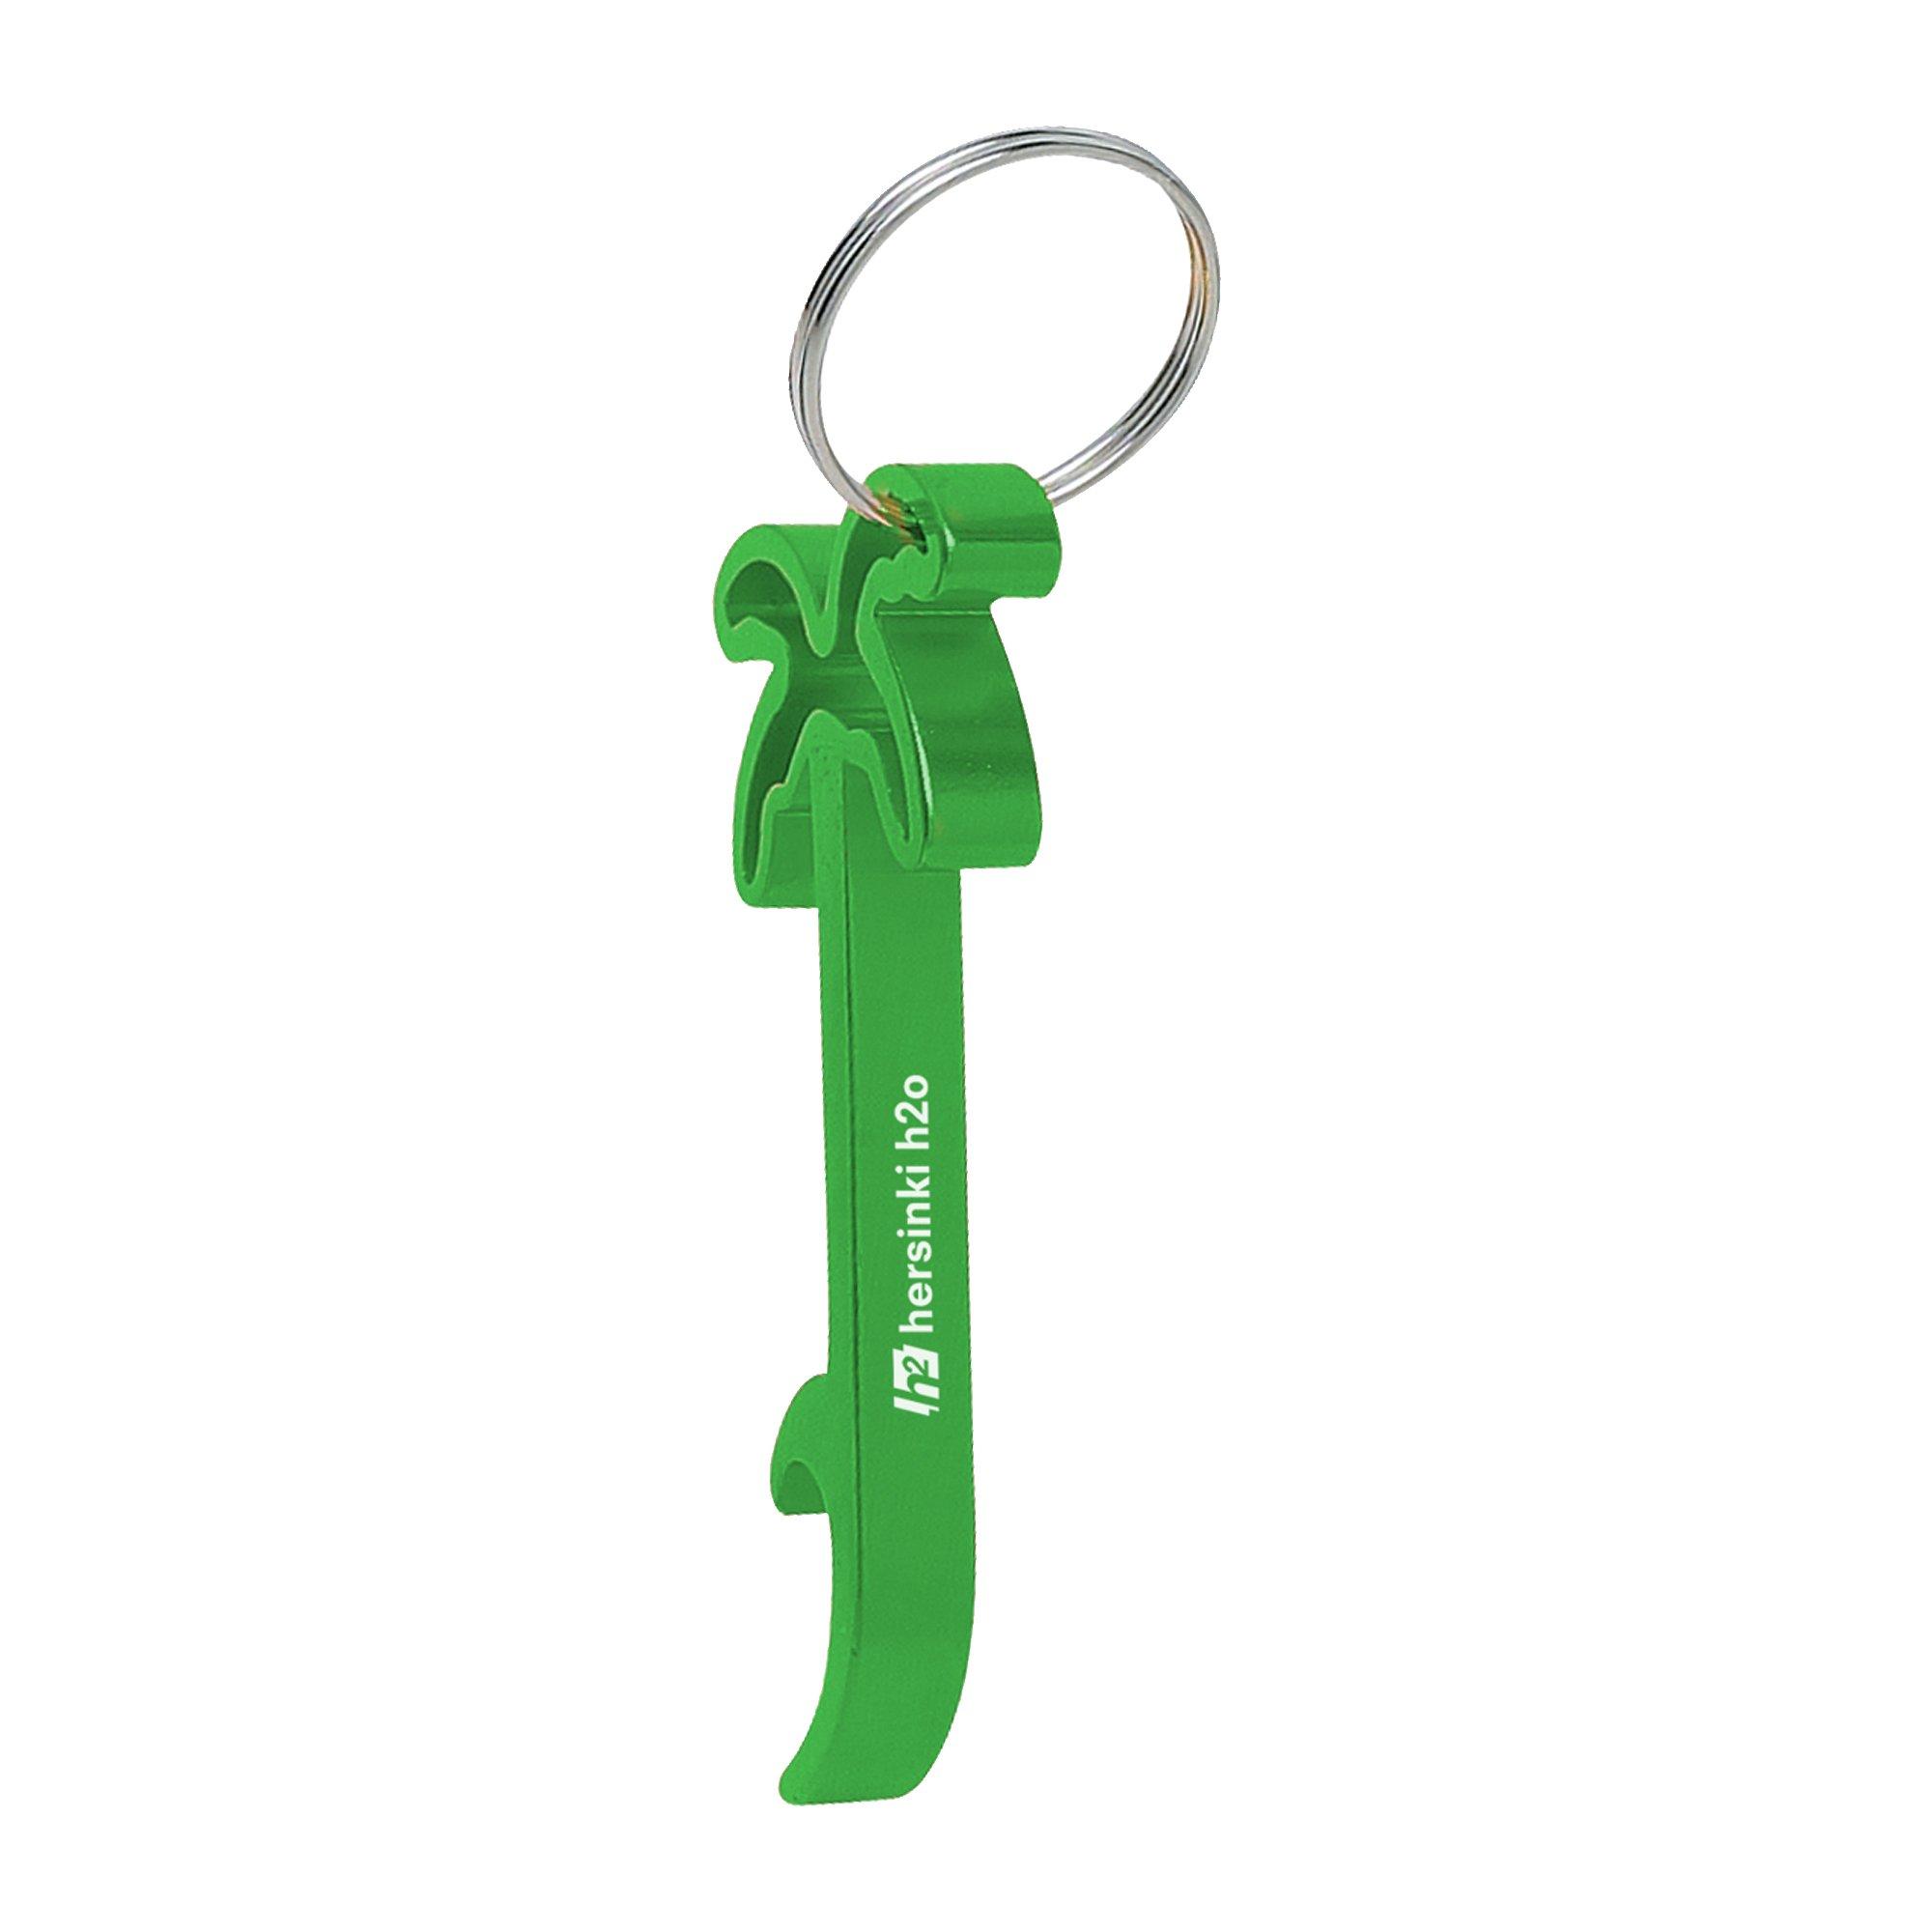 buy promotional palm tree bottle opener key ring at perfect pen. Black Bedroom Furniture Sets. Home Design Ideas